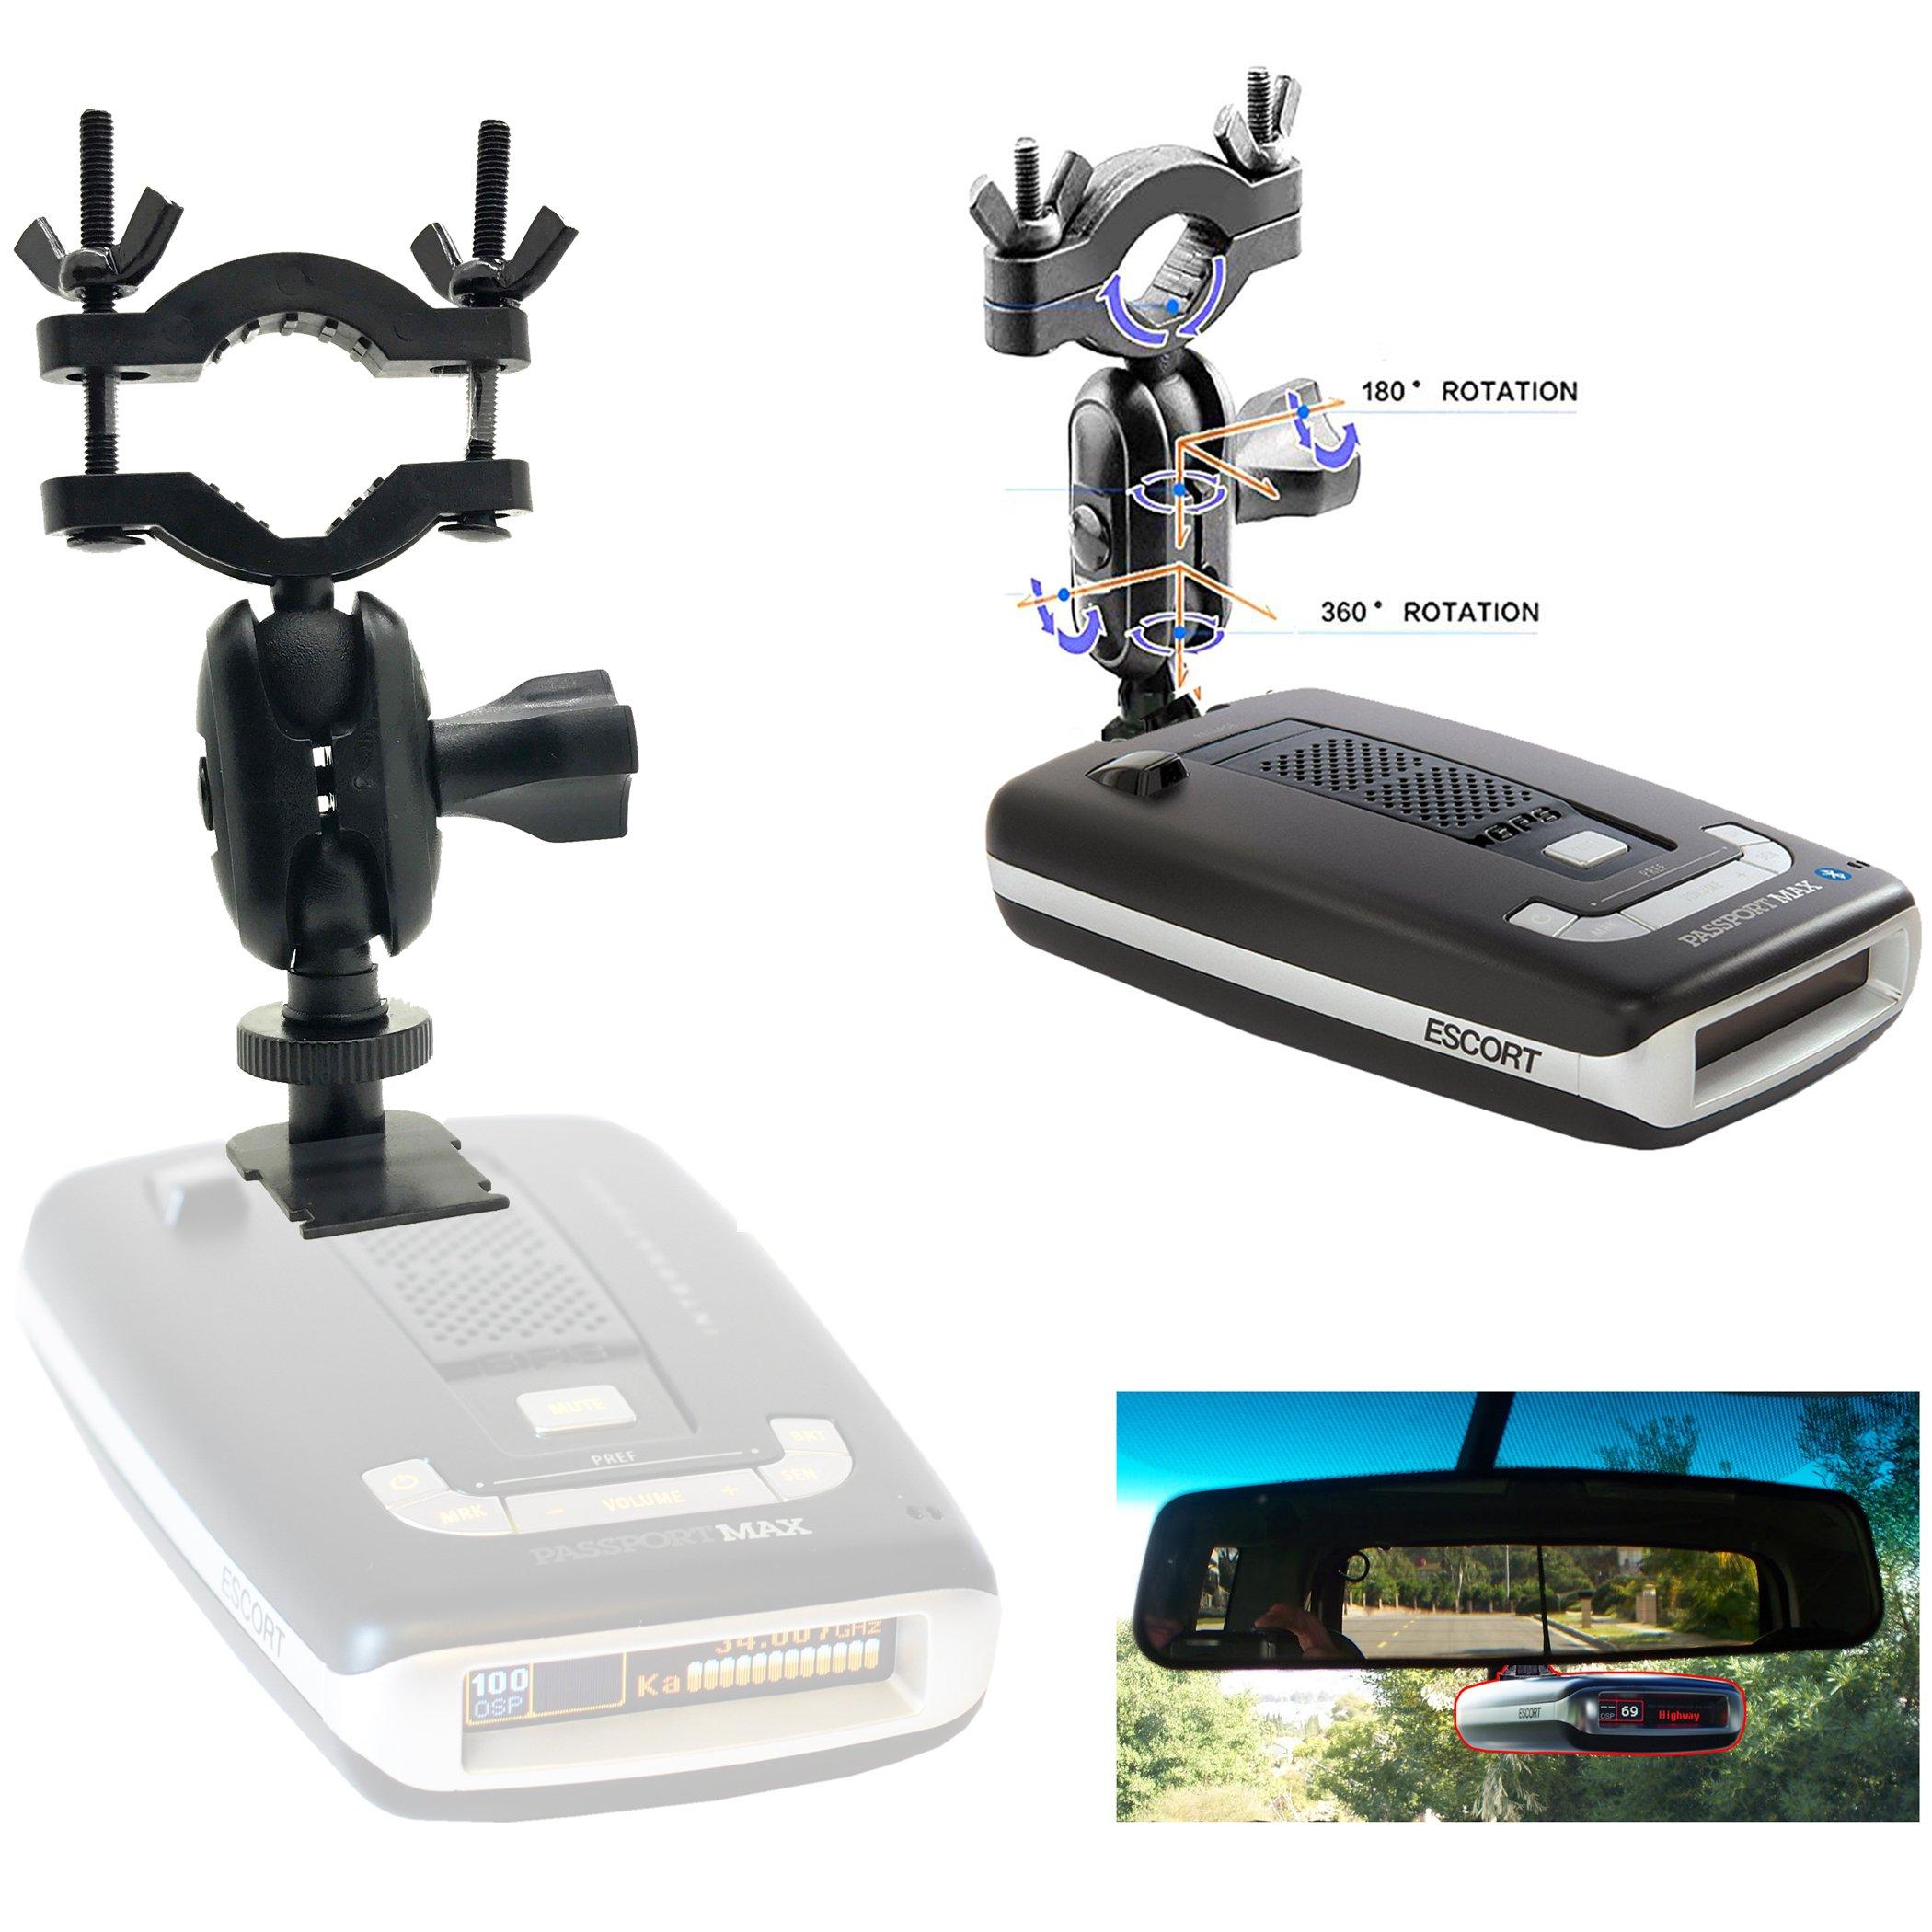 AccessoryBasics Car Rearview Mirror Radar Detector Mount for Escort PASSPORT Max / Max2 / Max 2 / Max II / Max360 (NOT COMPATIBLE with MAX360C MAGNETIC cradle radar)